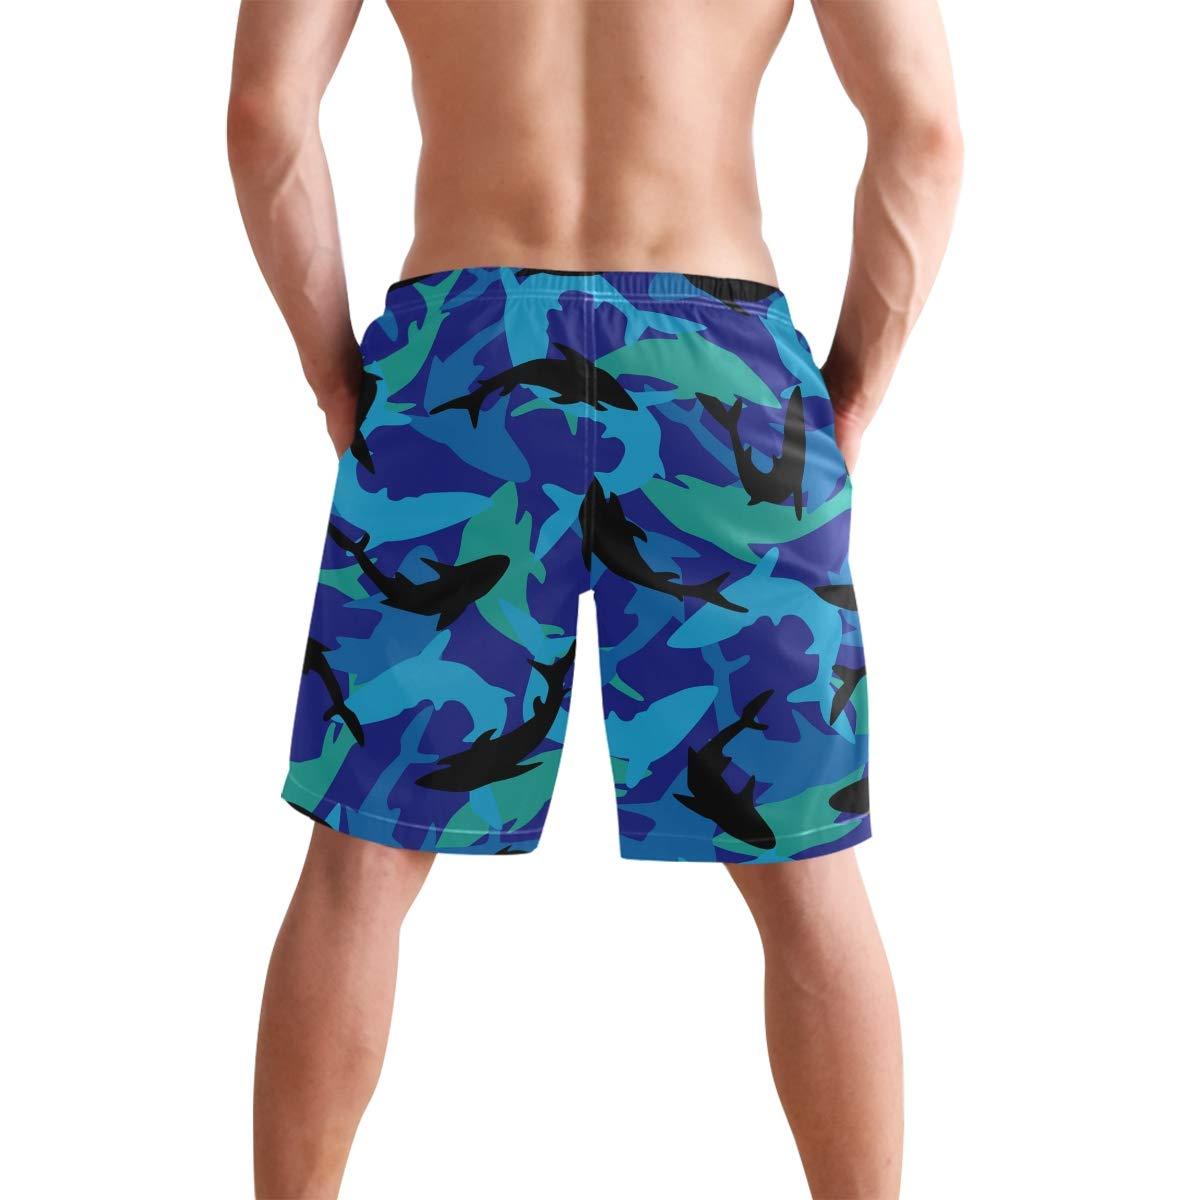 Mens Swim Trunks Sharks Pattern Black Green Blue Drawstring Boardshorts